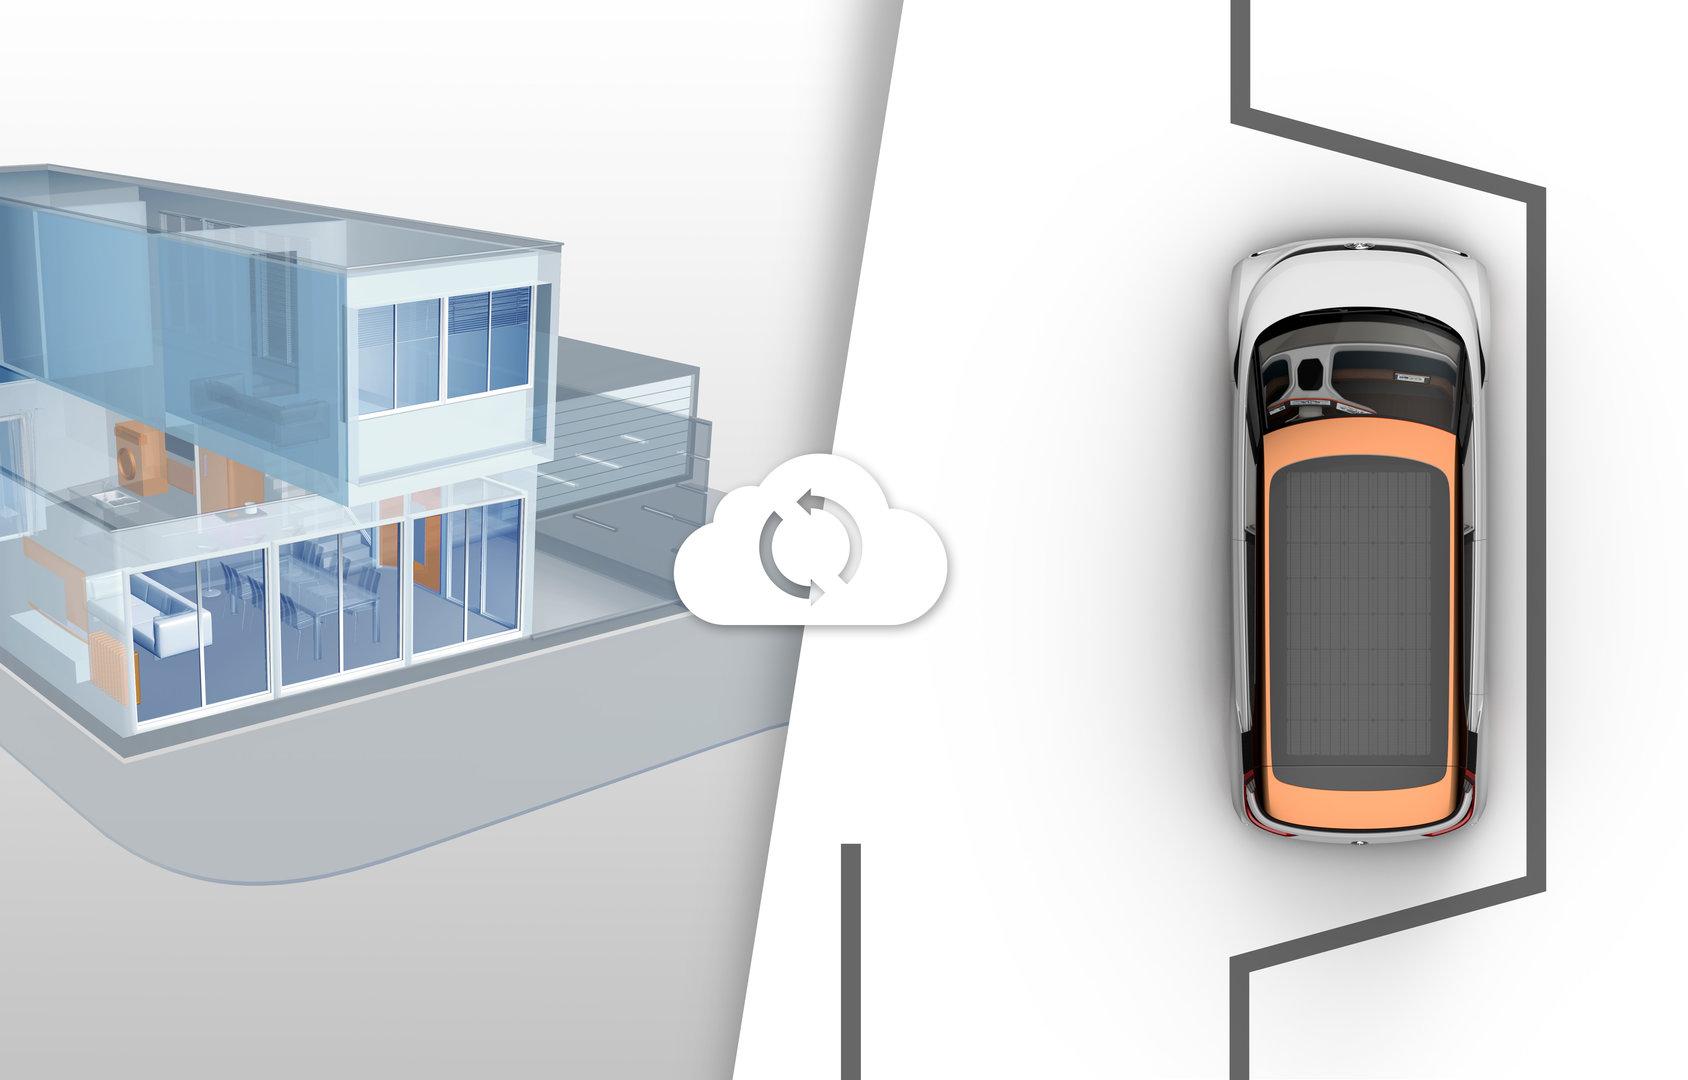 Vernetzung mit dem Smart Home